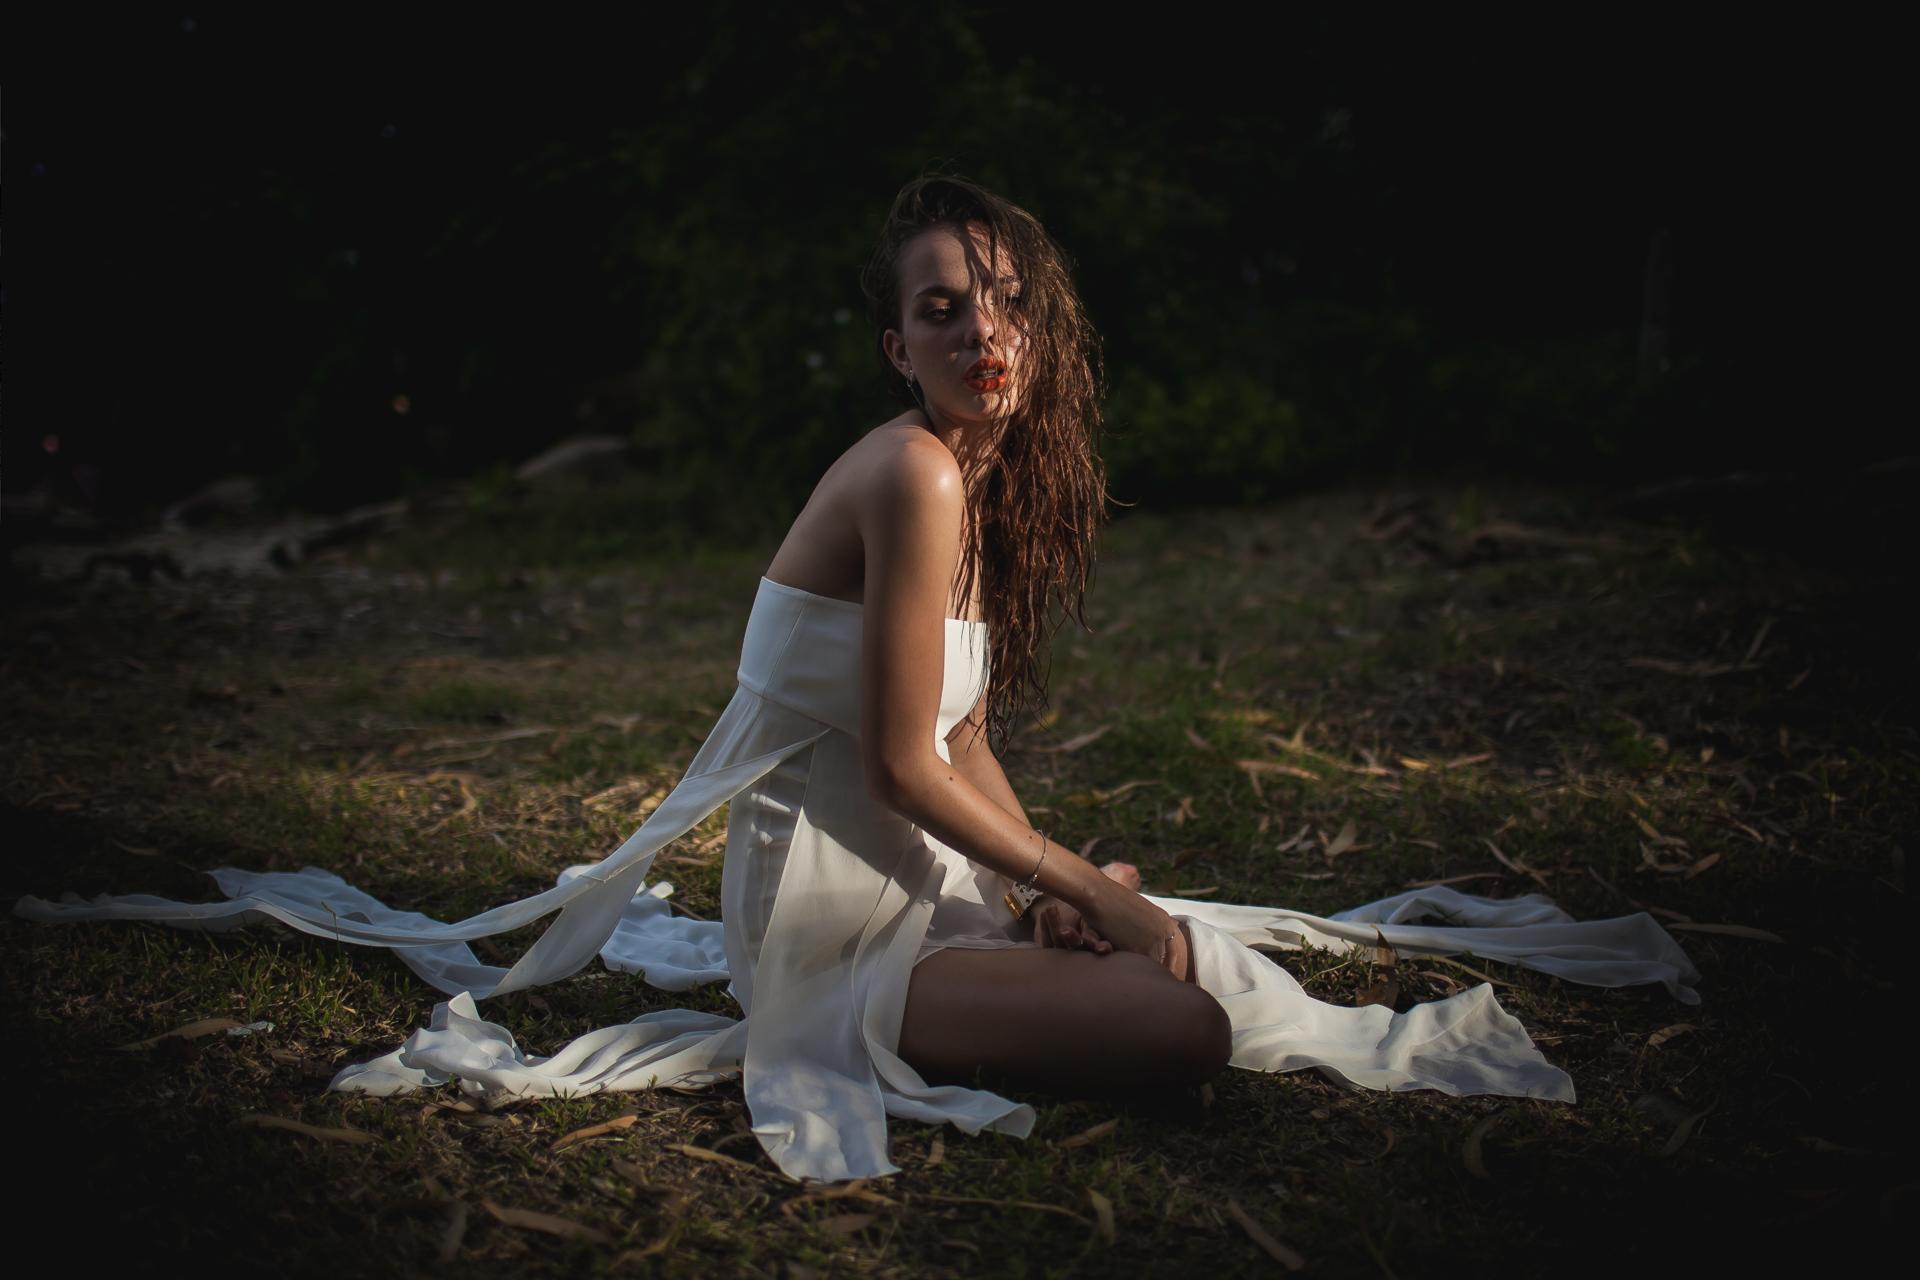 Russian model in beach photoshoot